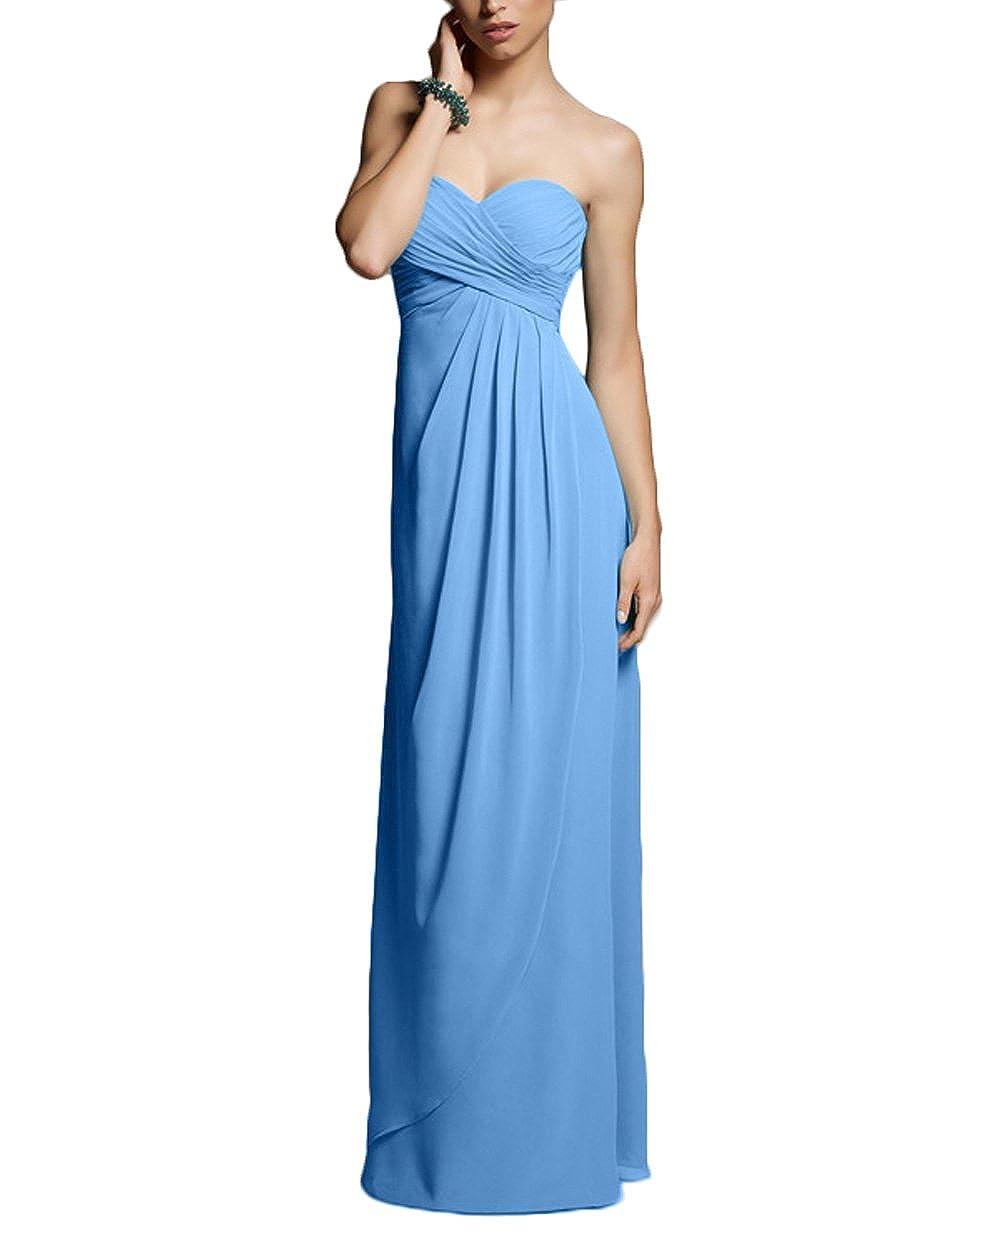 CaliaDress Women Sweetheart Long Bridesmaid Dress Formal Gowns C282LF